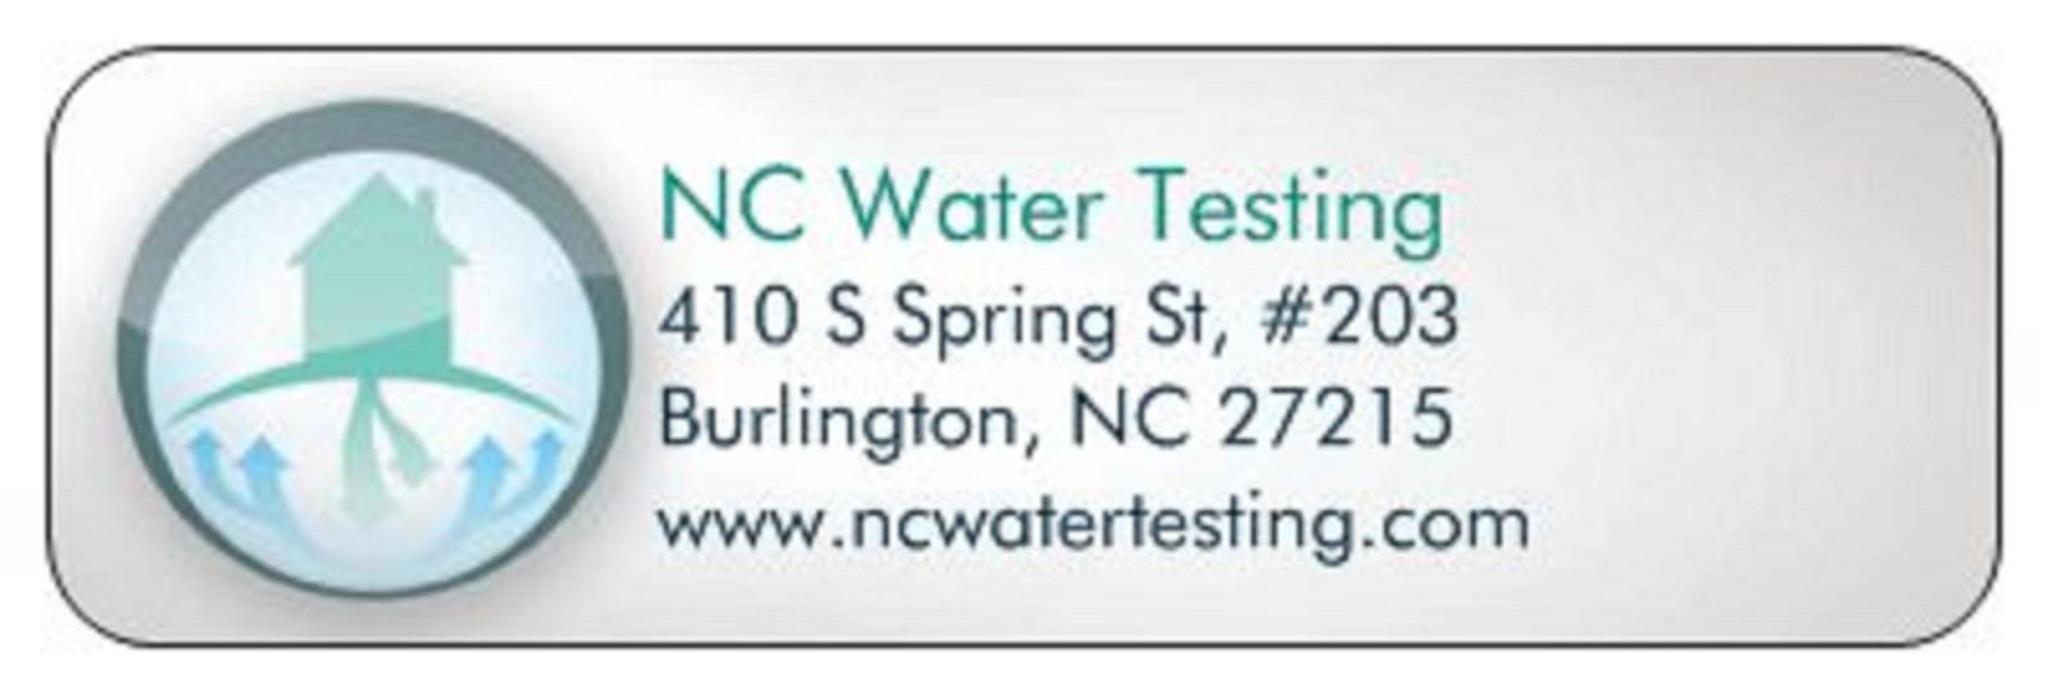 www.ncwatertesting.com